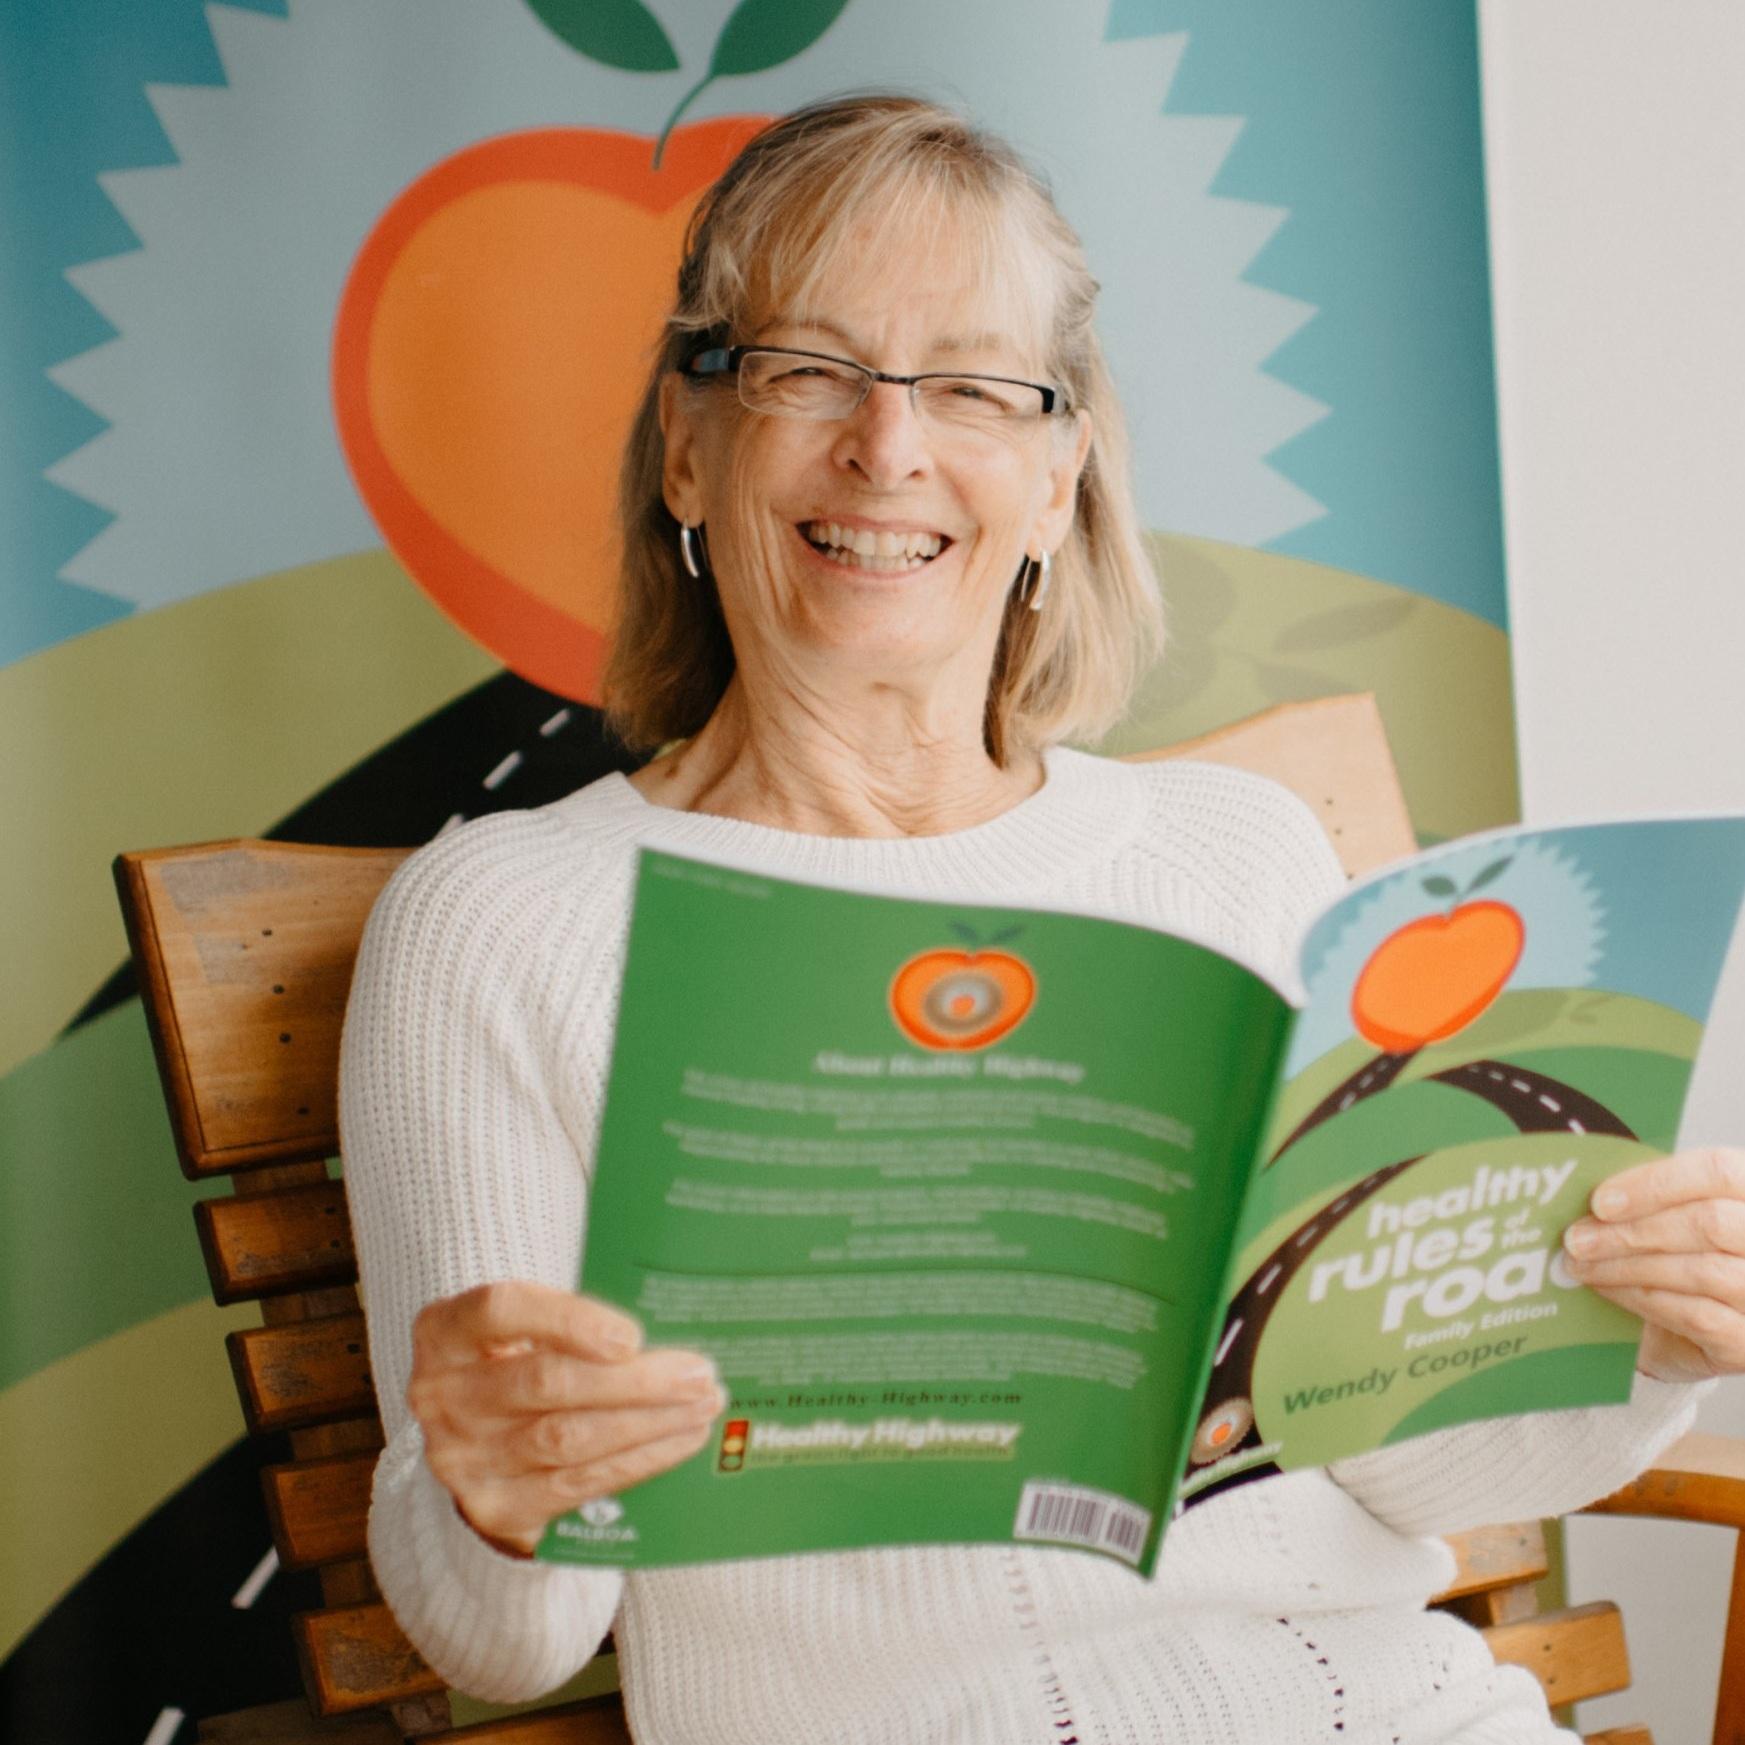 Wendy Cooper  // Founder & President of Healthy Highway